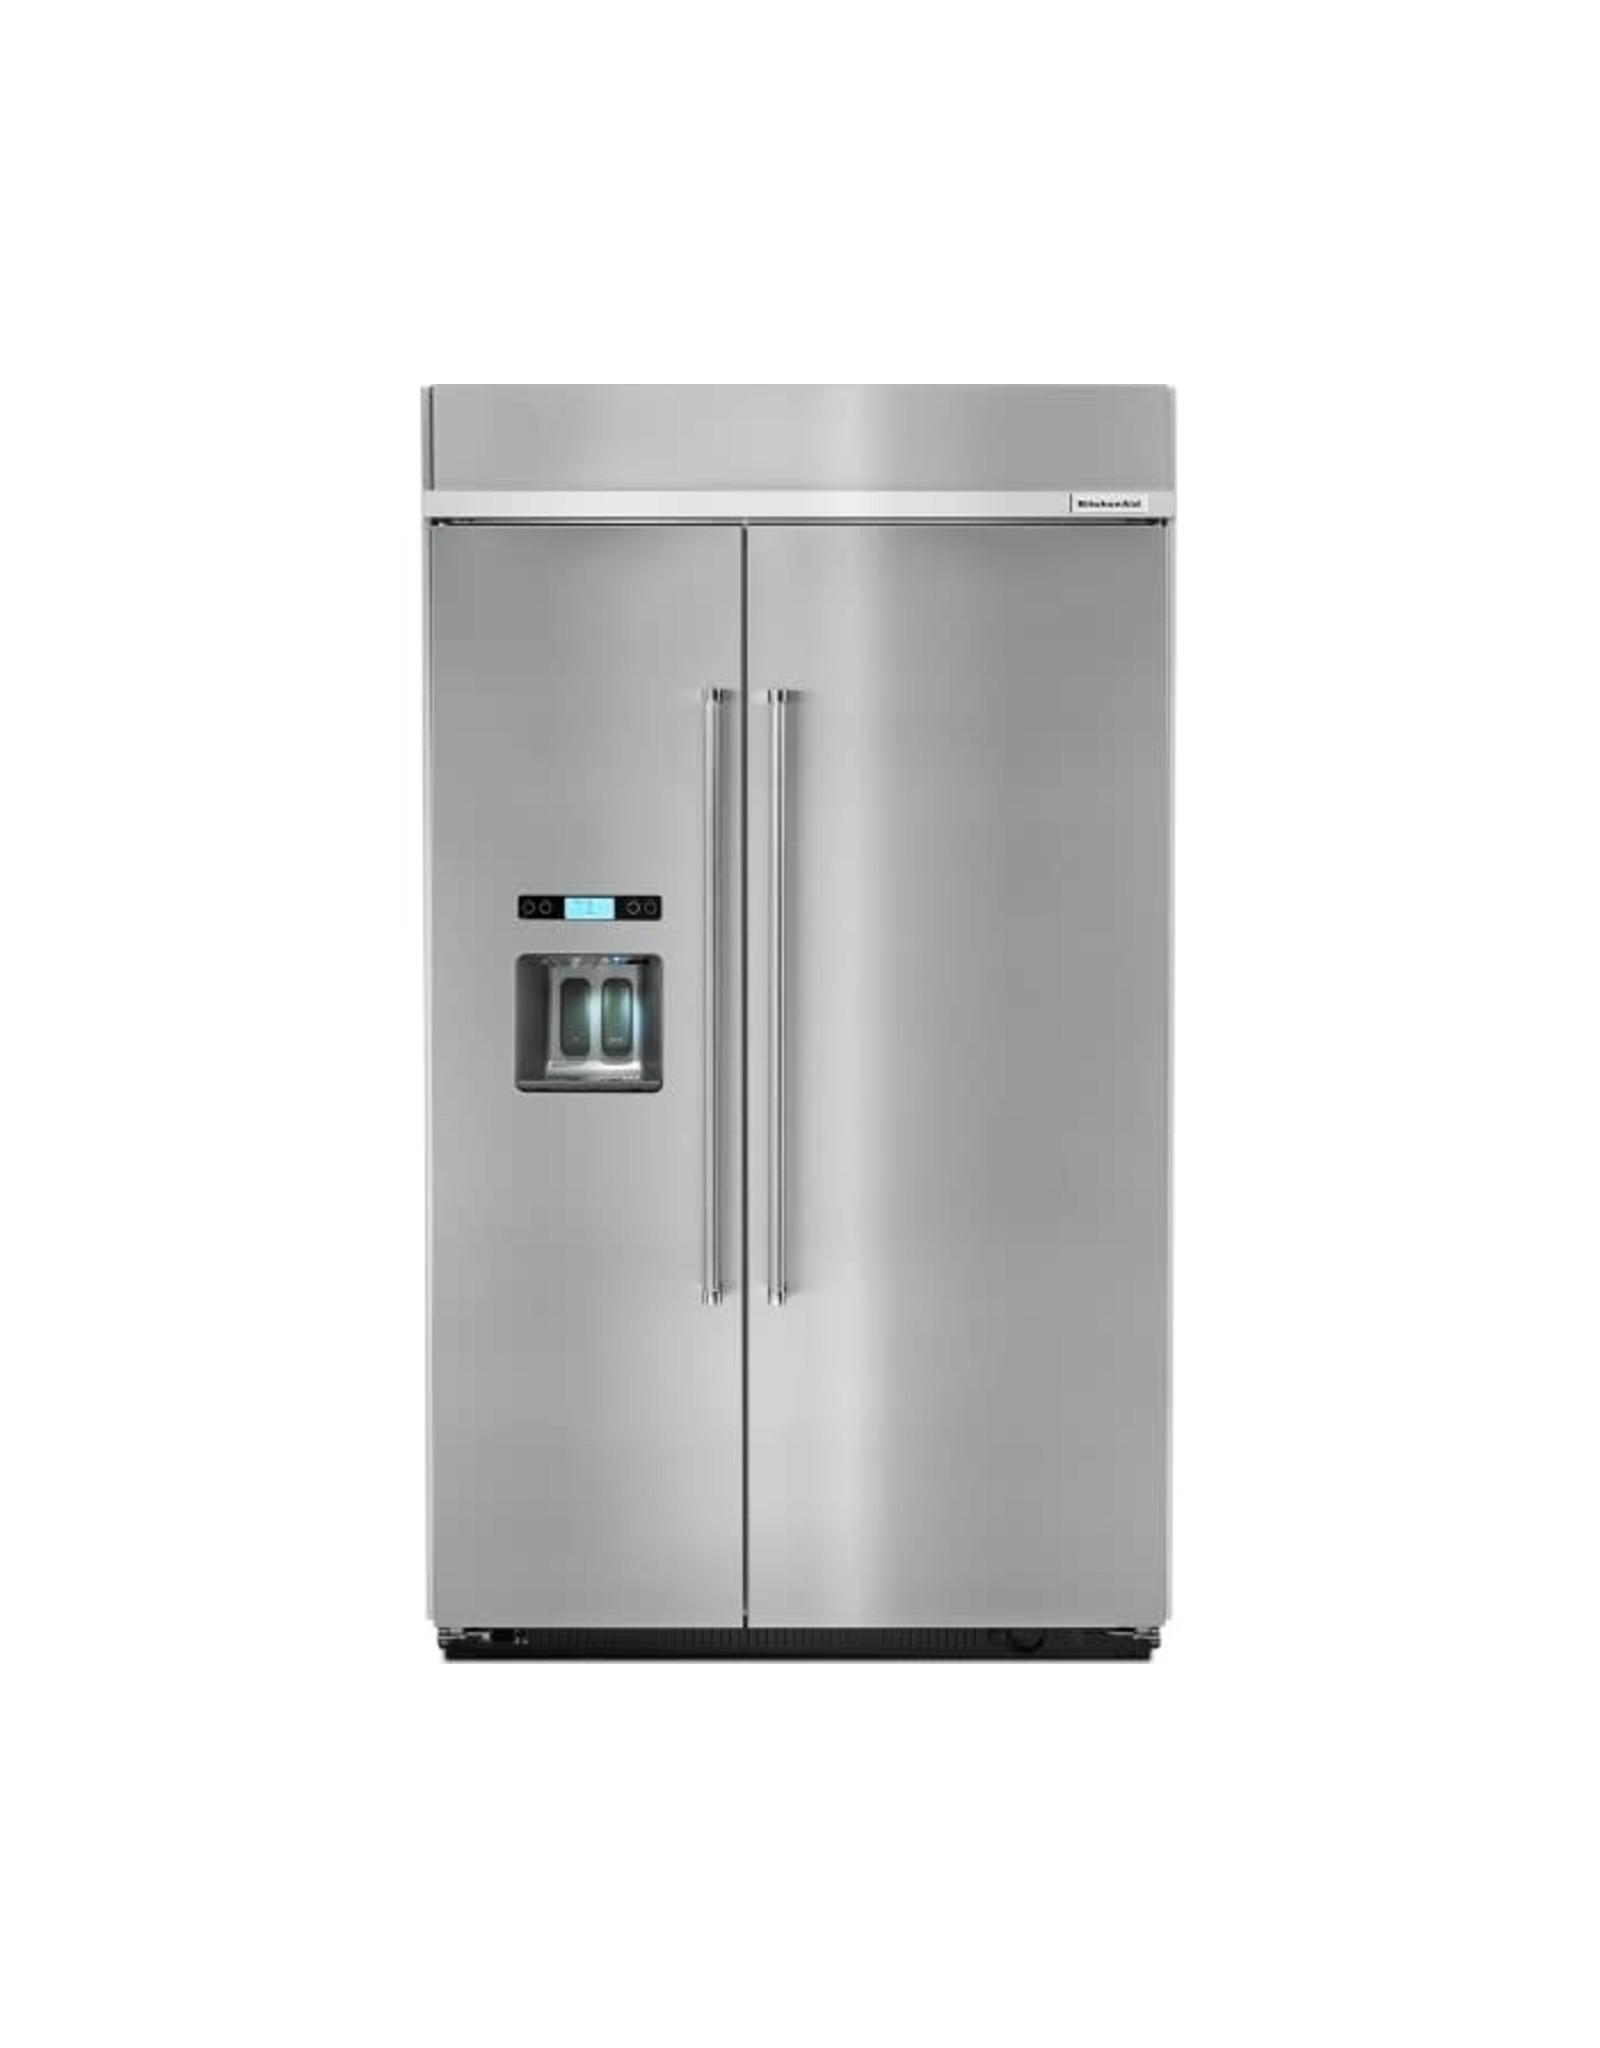 "KBSD608ESS KAD No Frost Side - Built-in Refr Frez - 48"" SXS, STAINLESS STEEL, DISPENSER, ENE"